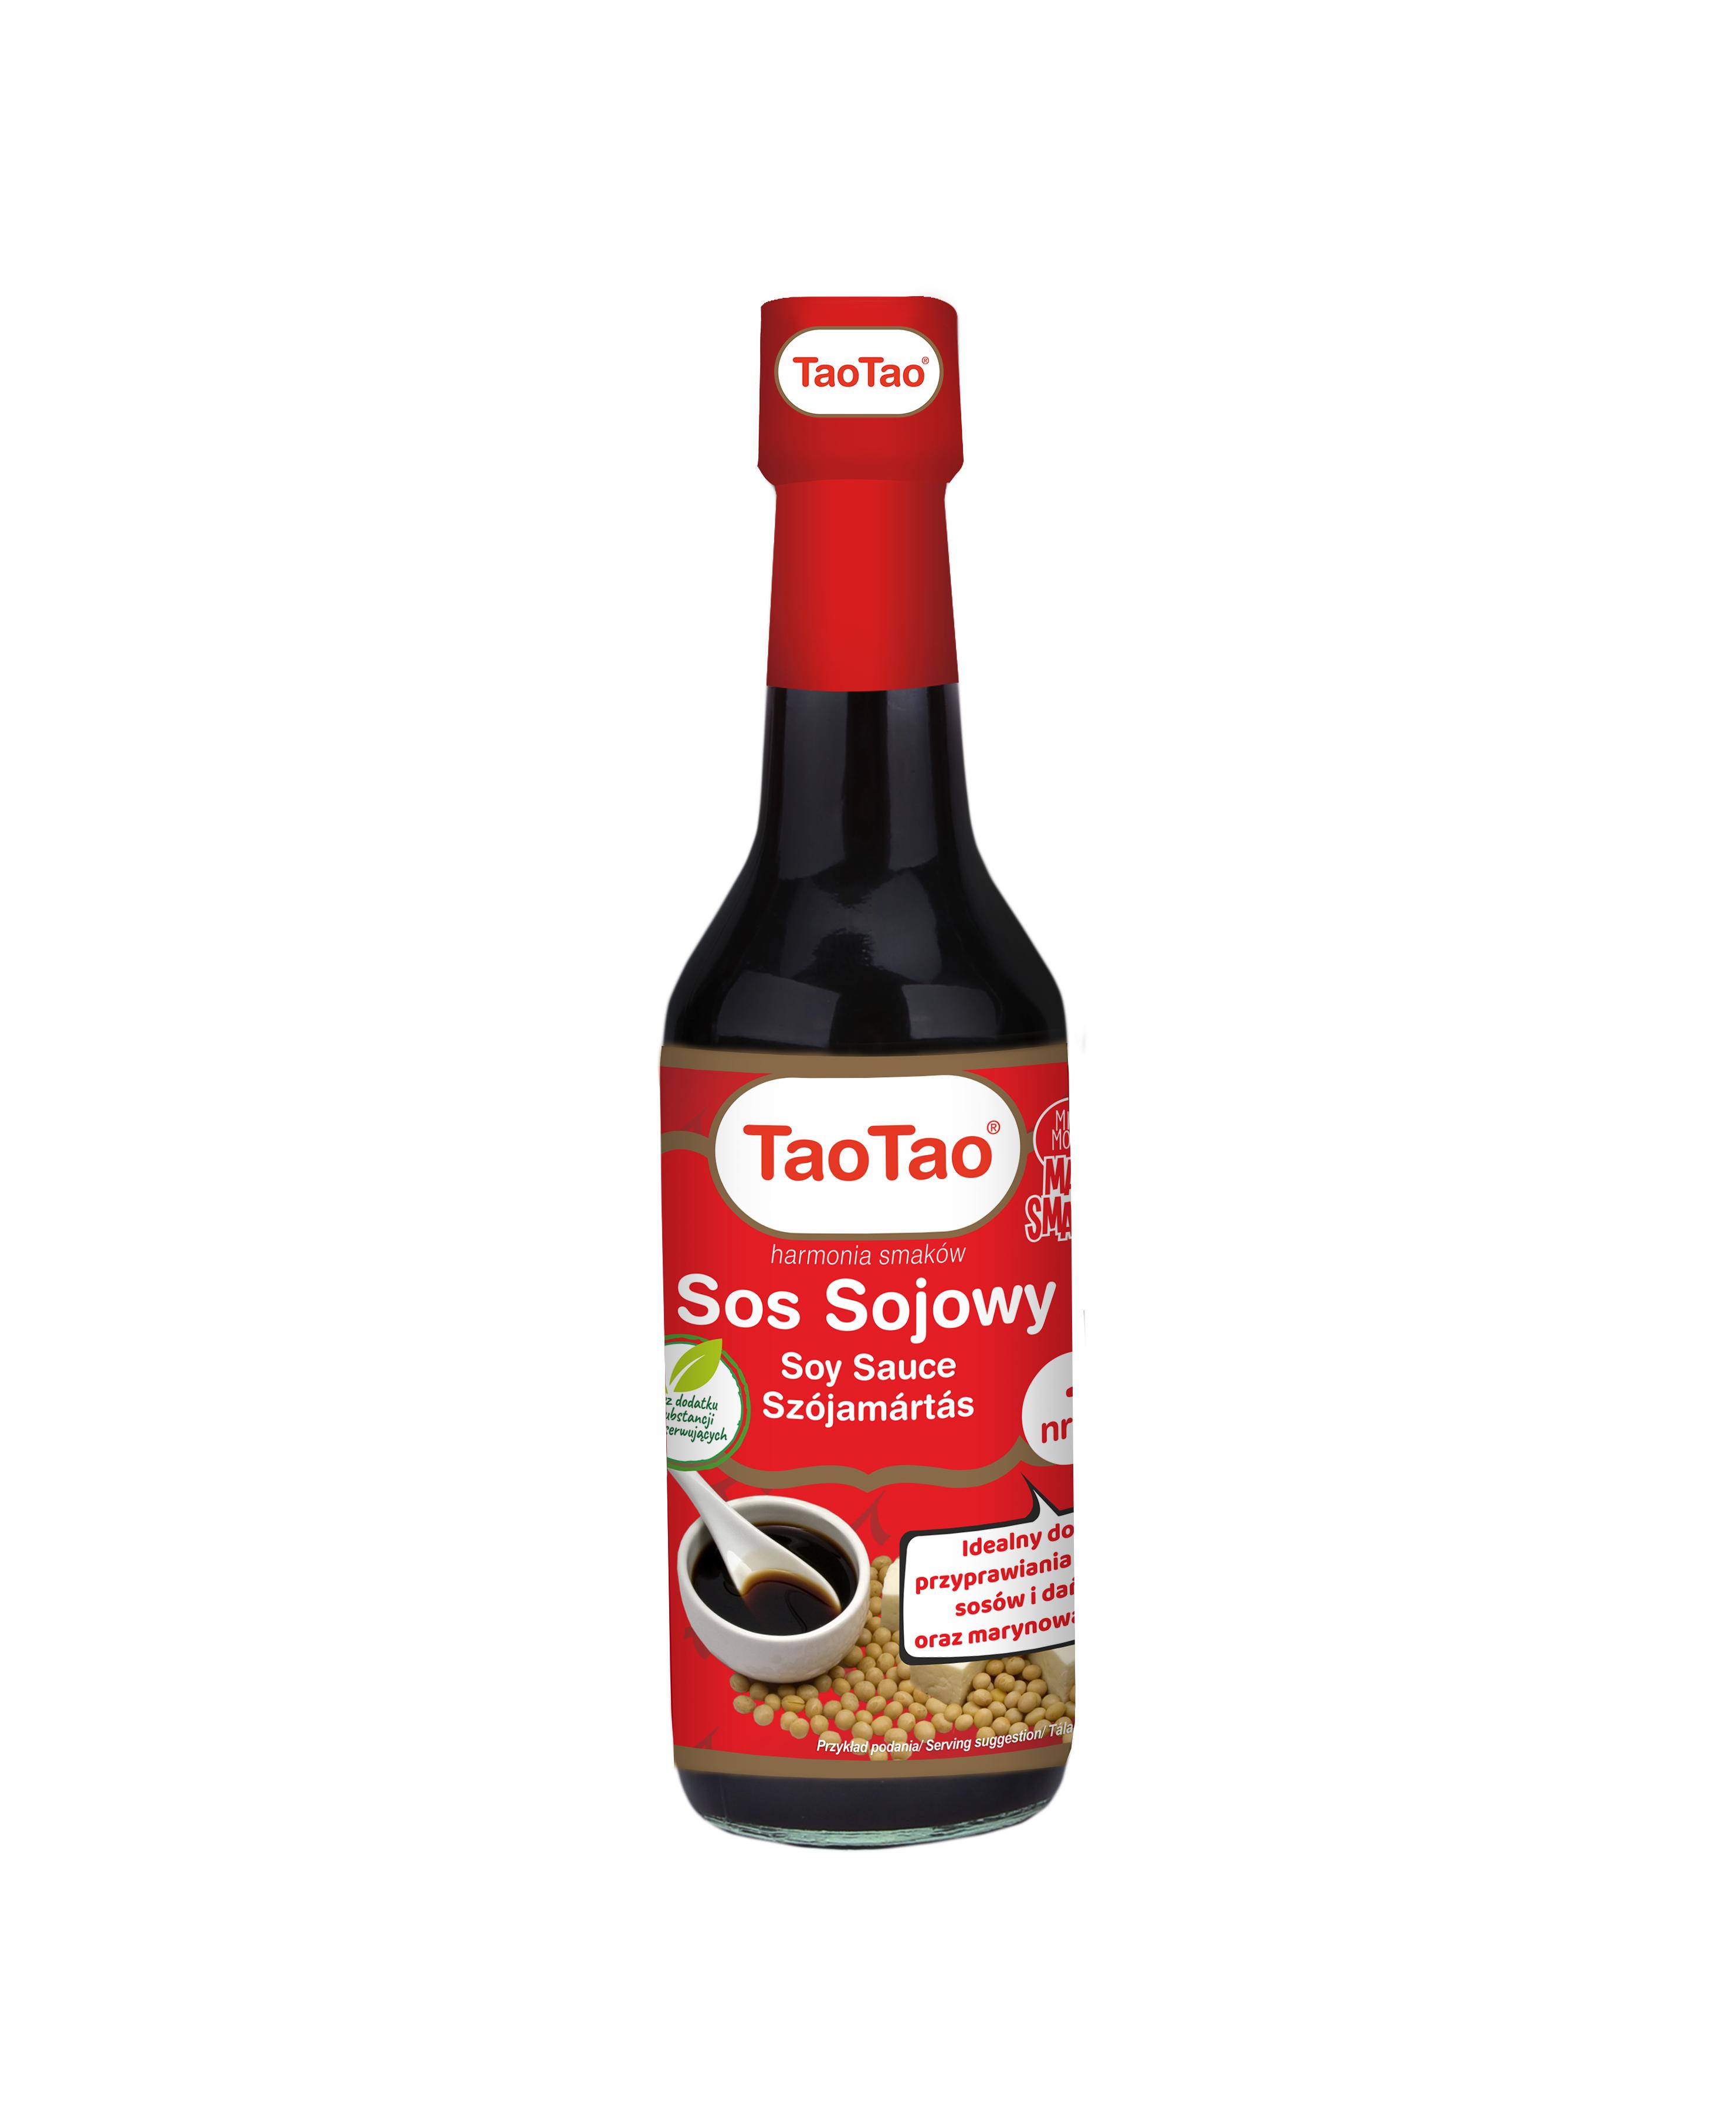 sos sojowy 150